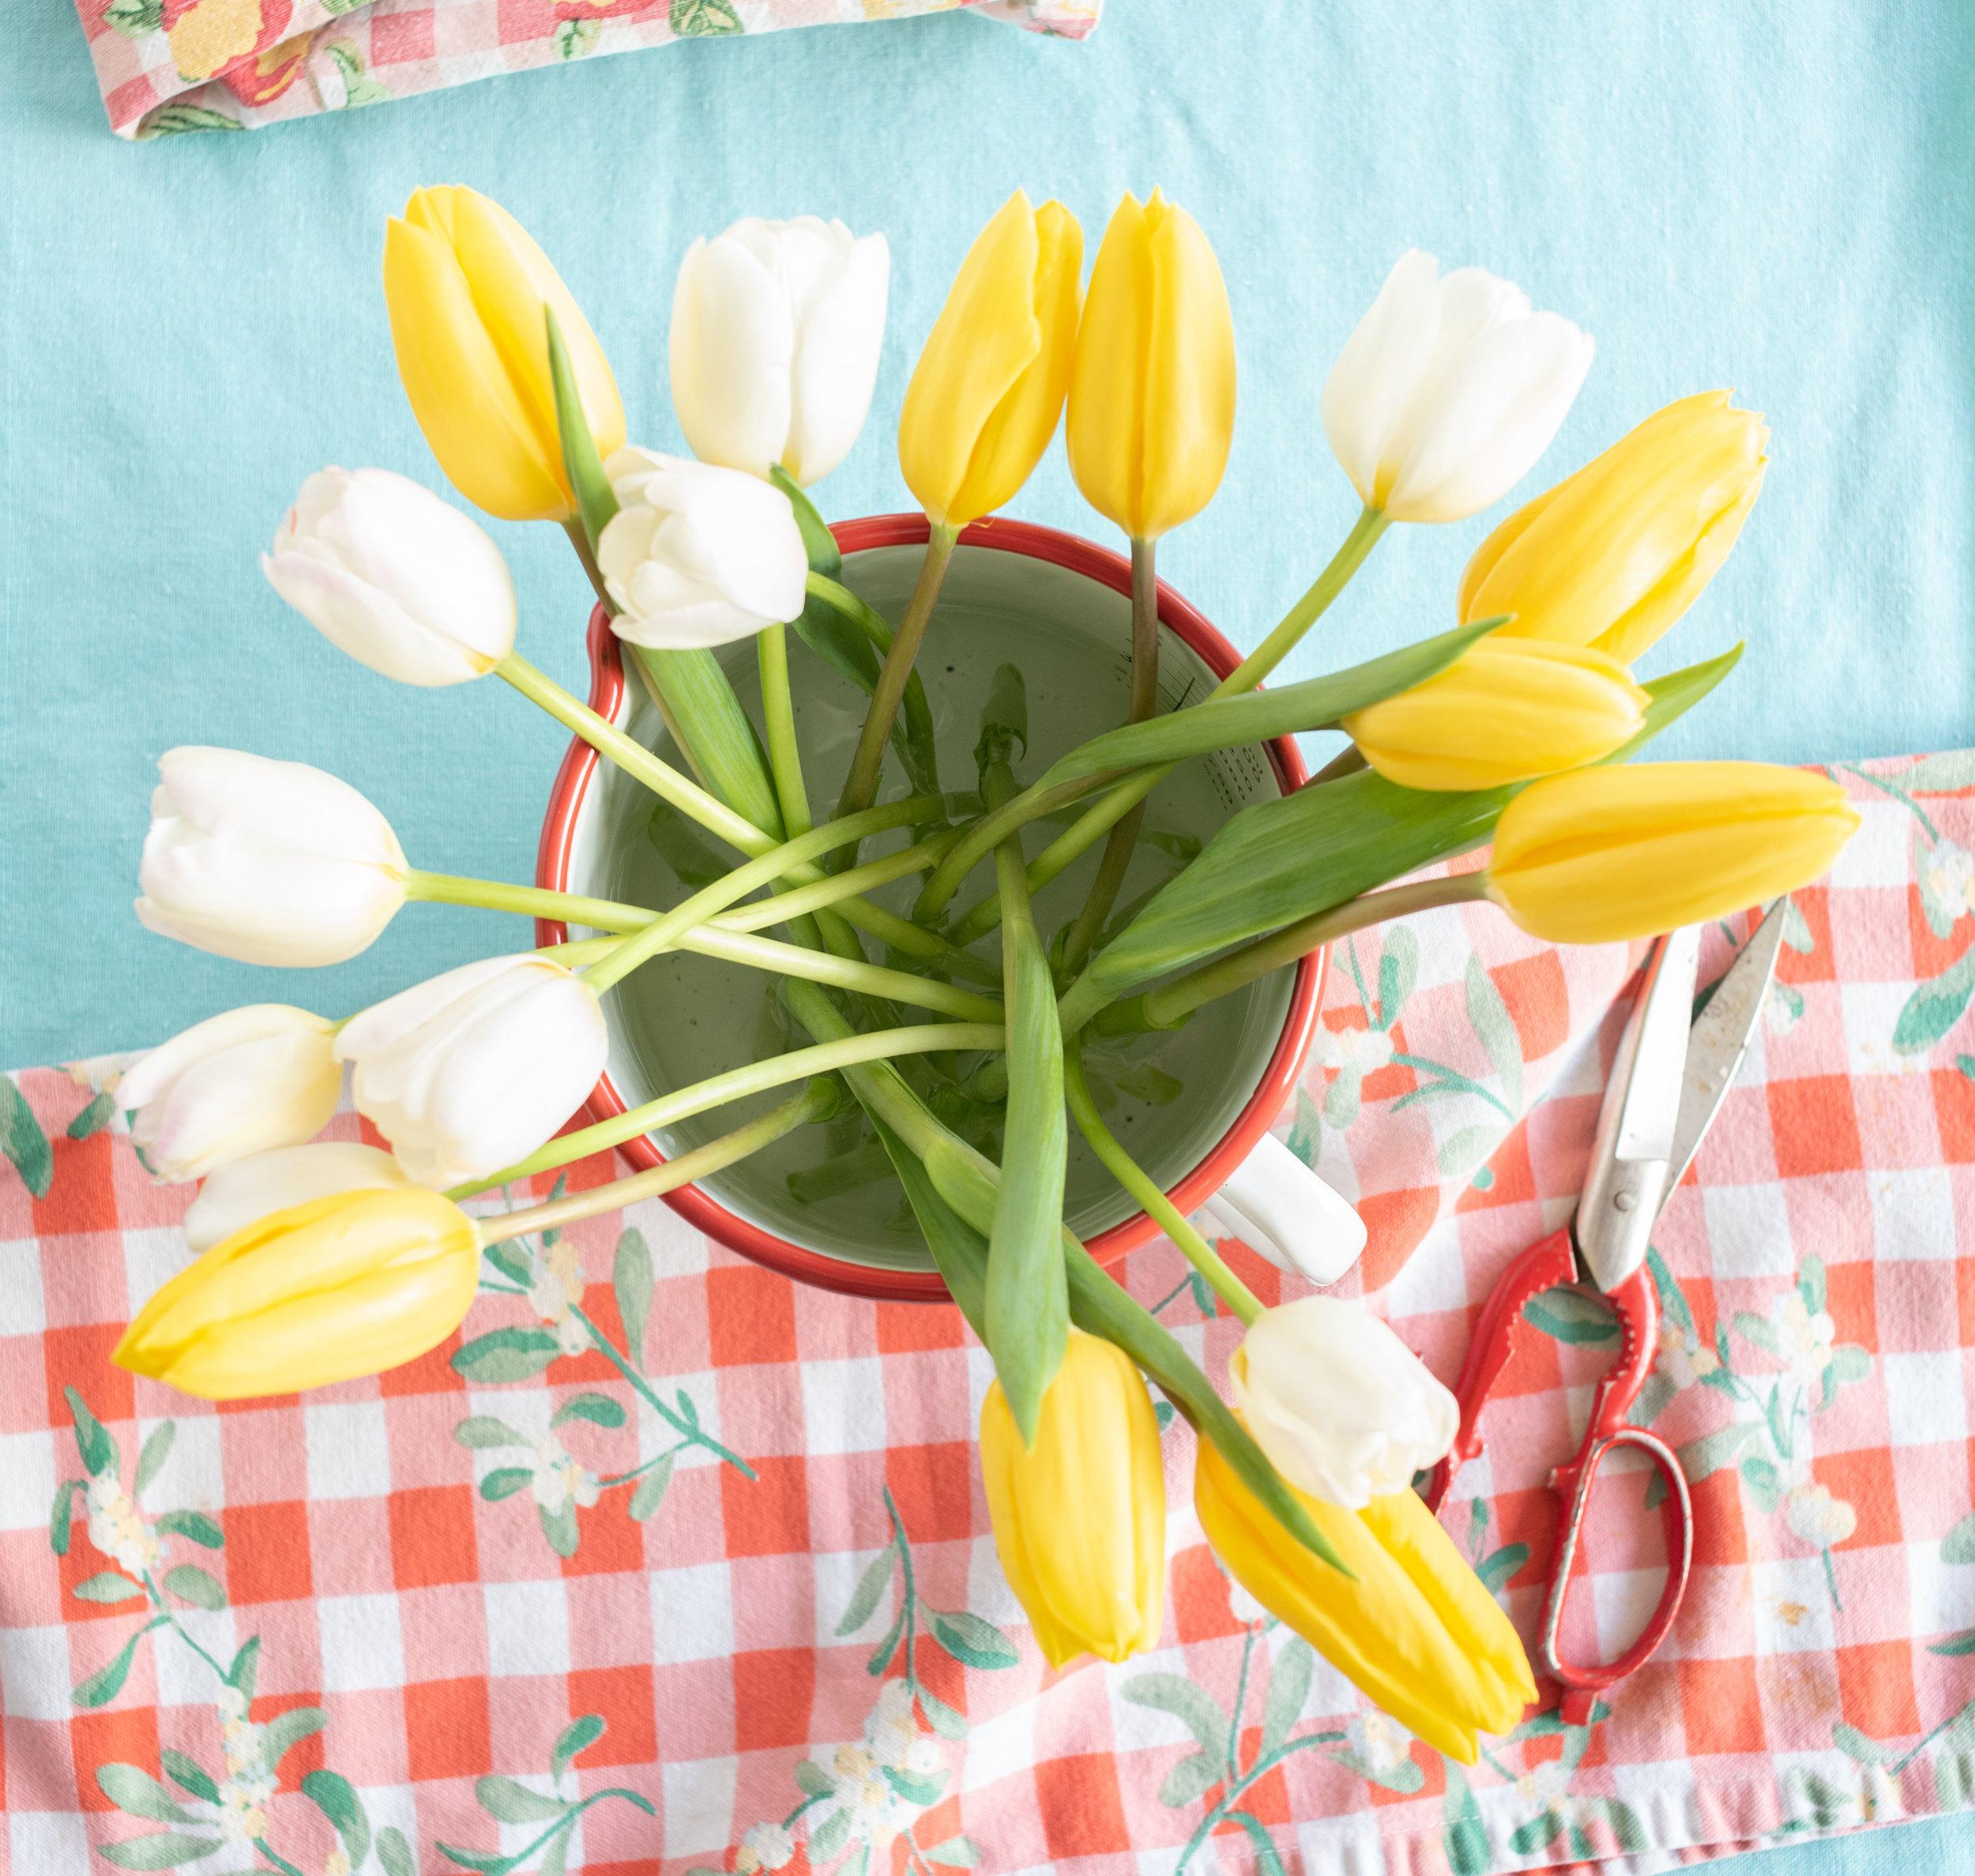 lasvegasflowers.jpg